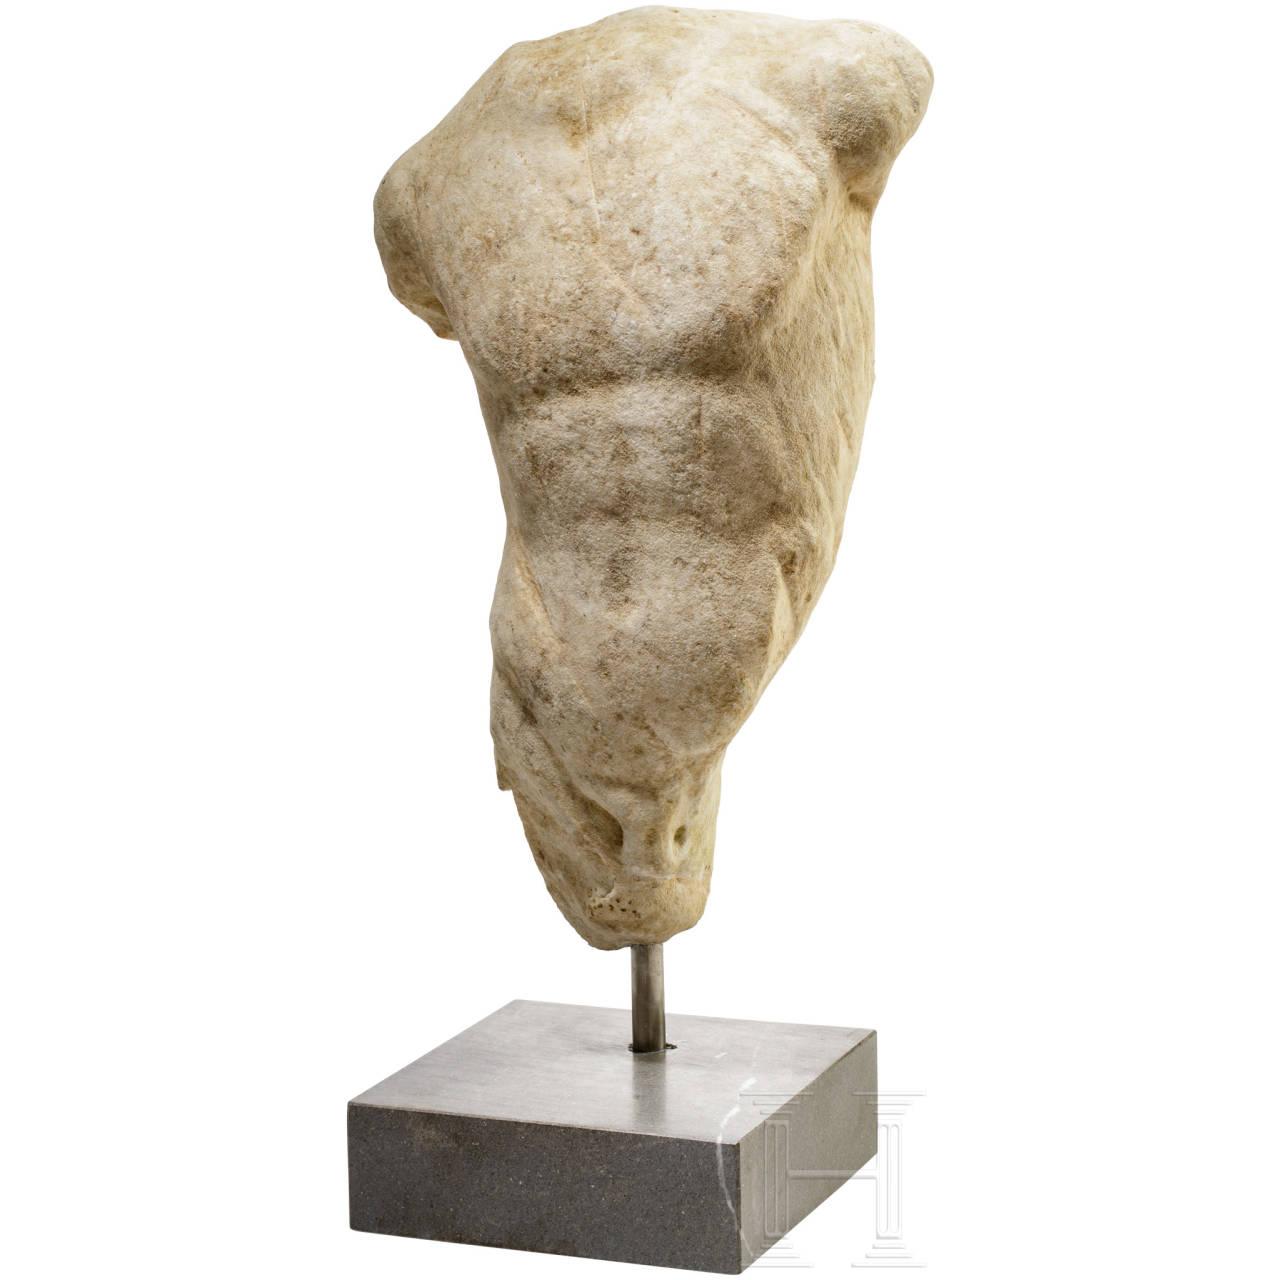 Marmortorso eines Jünglings, römisch, 1. Jhdt.